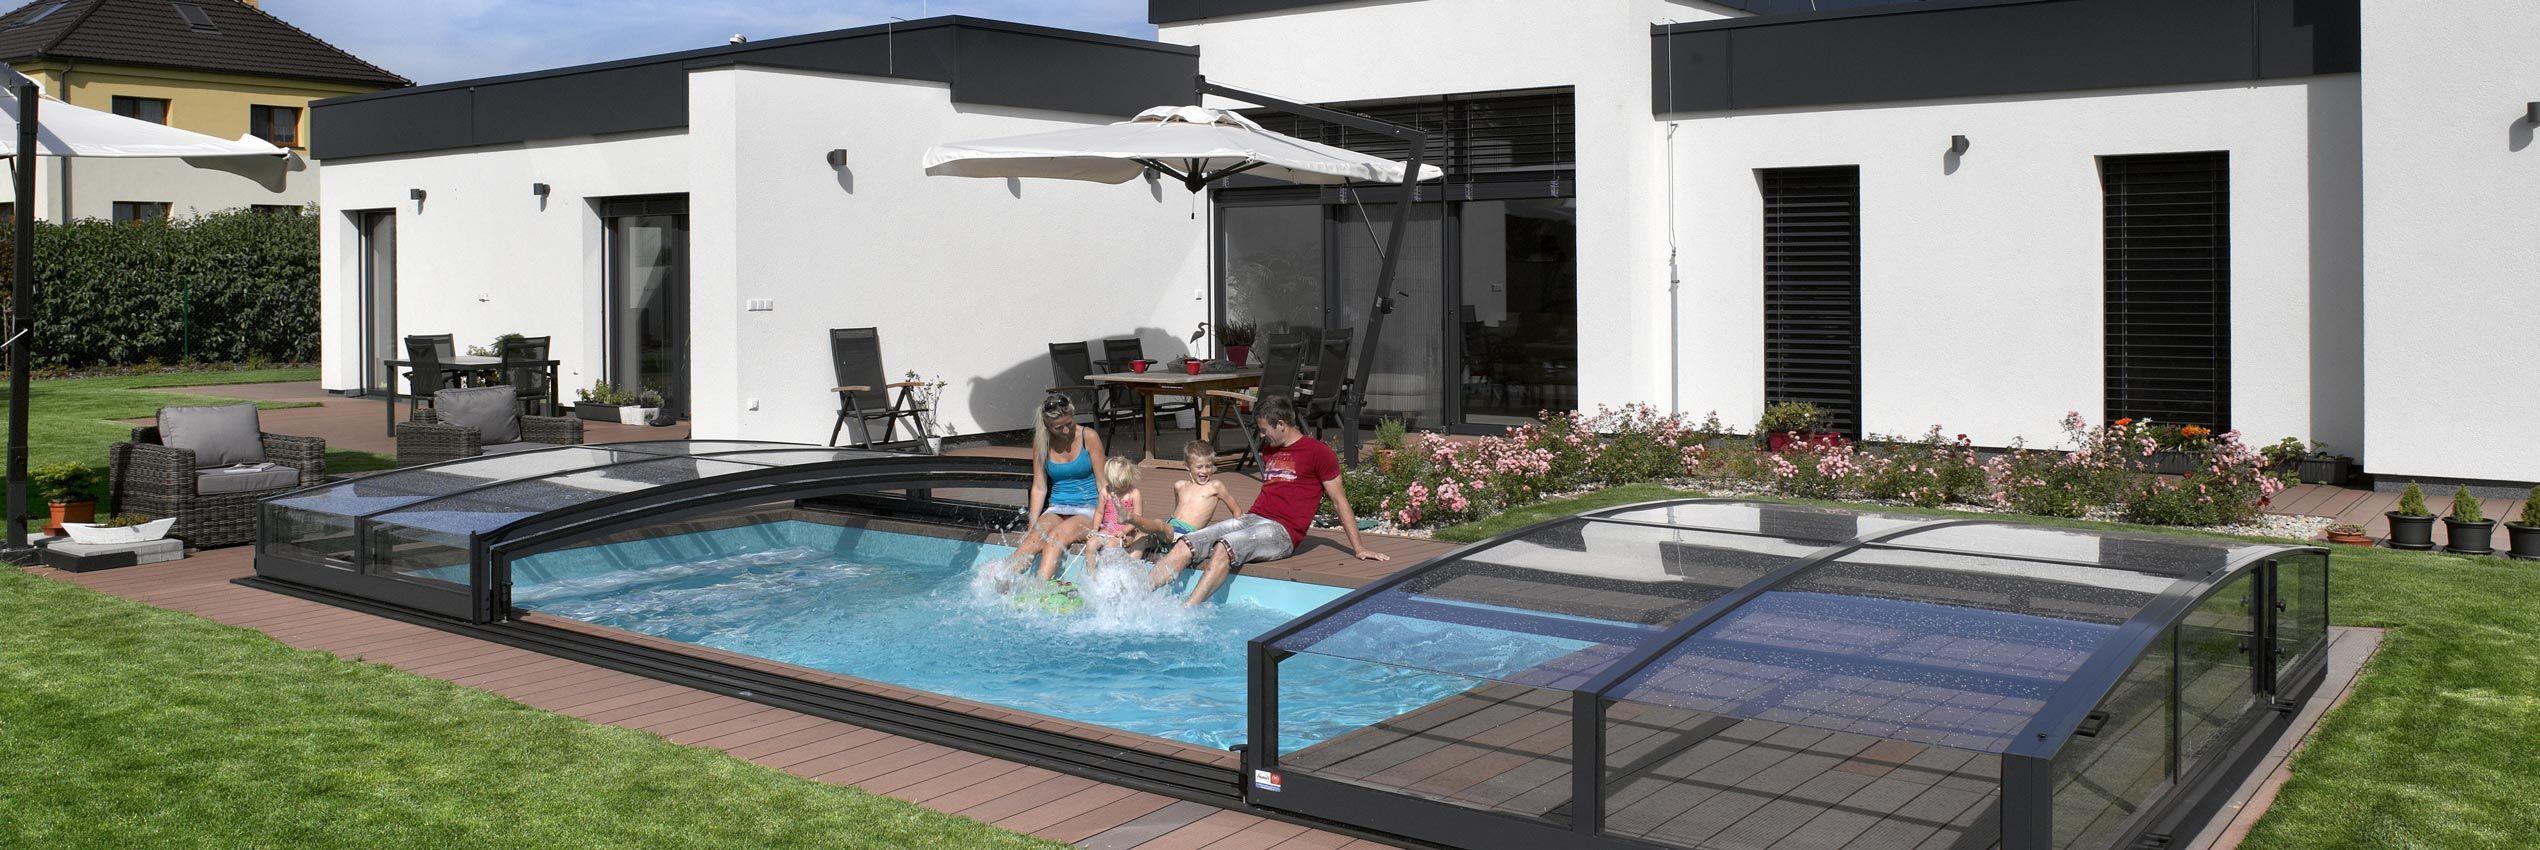 Low pool enclosure Viva from Alukov